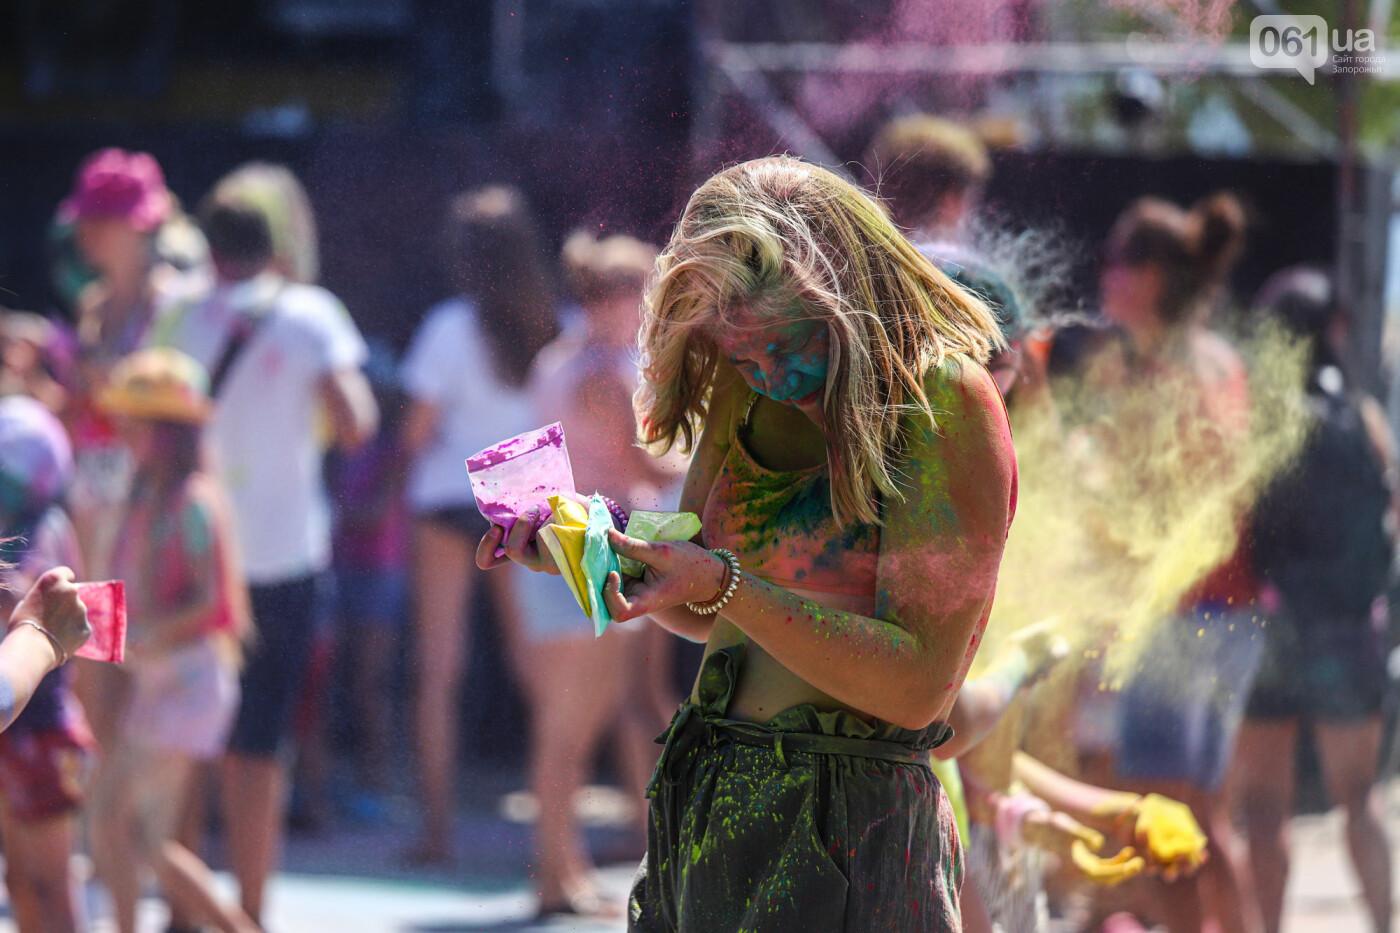 Сотни запорожцев приняли участие в фестивале красок Холи, - ФОТОРЕПОРТАЖ, фото-8